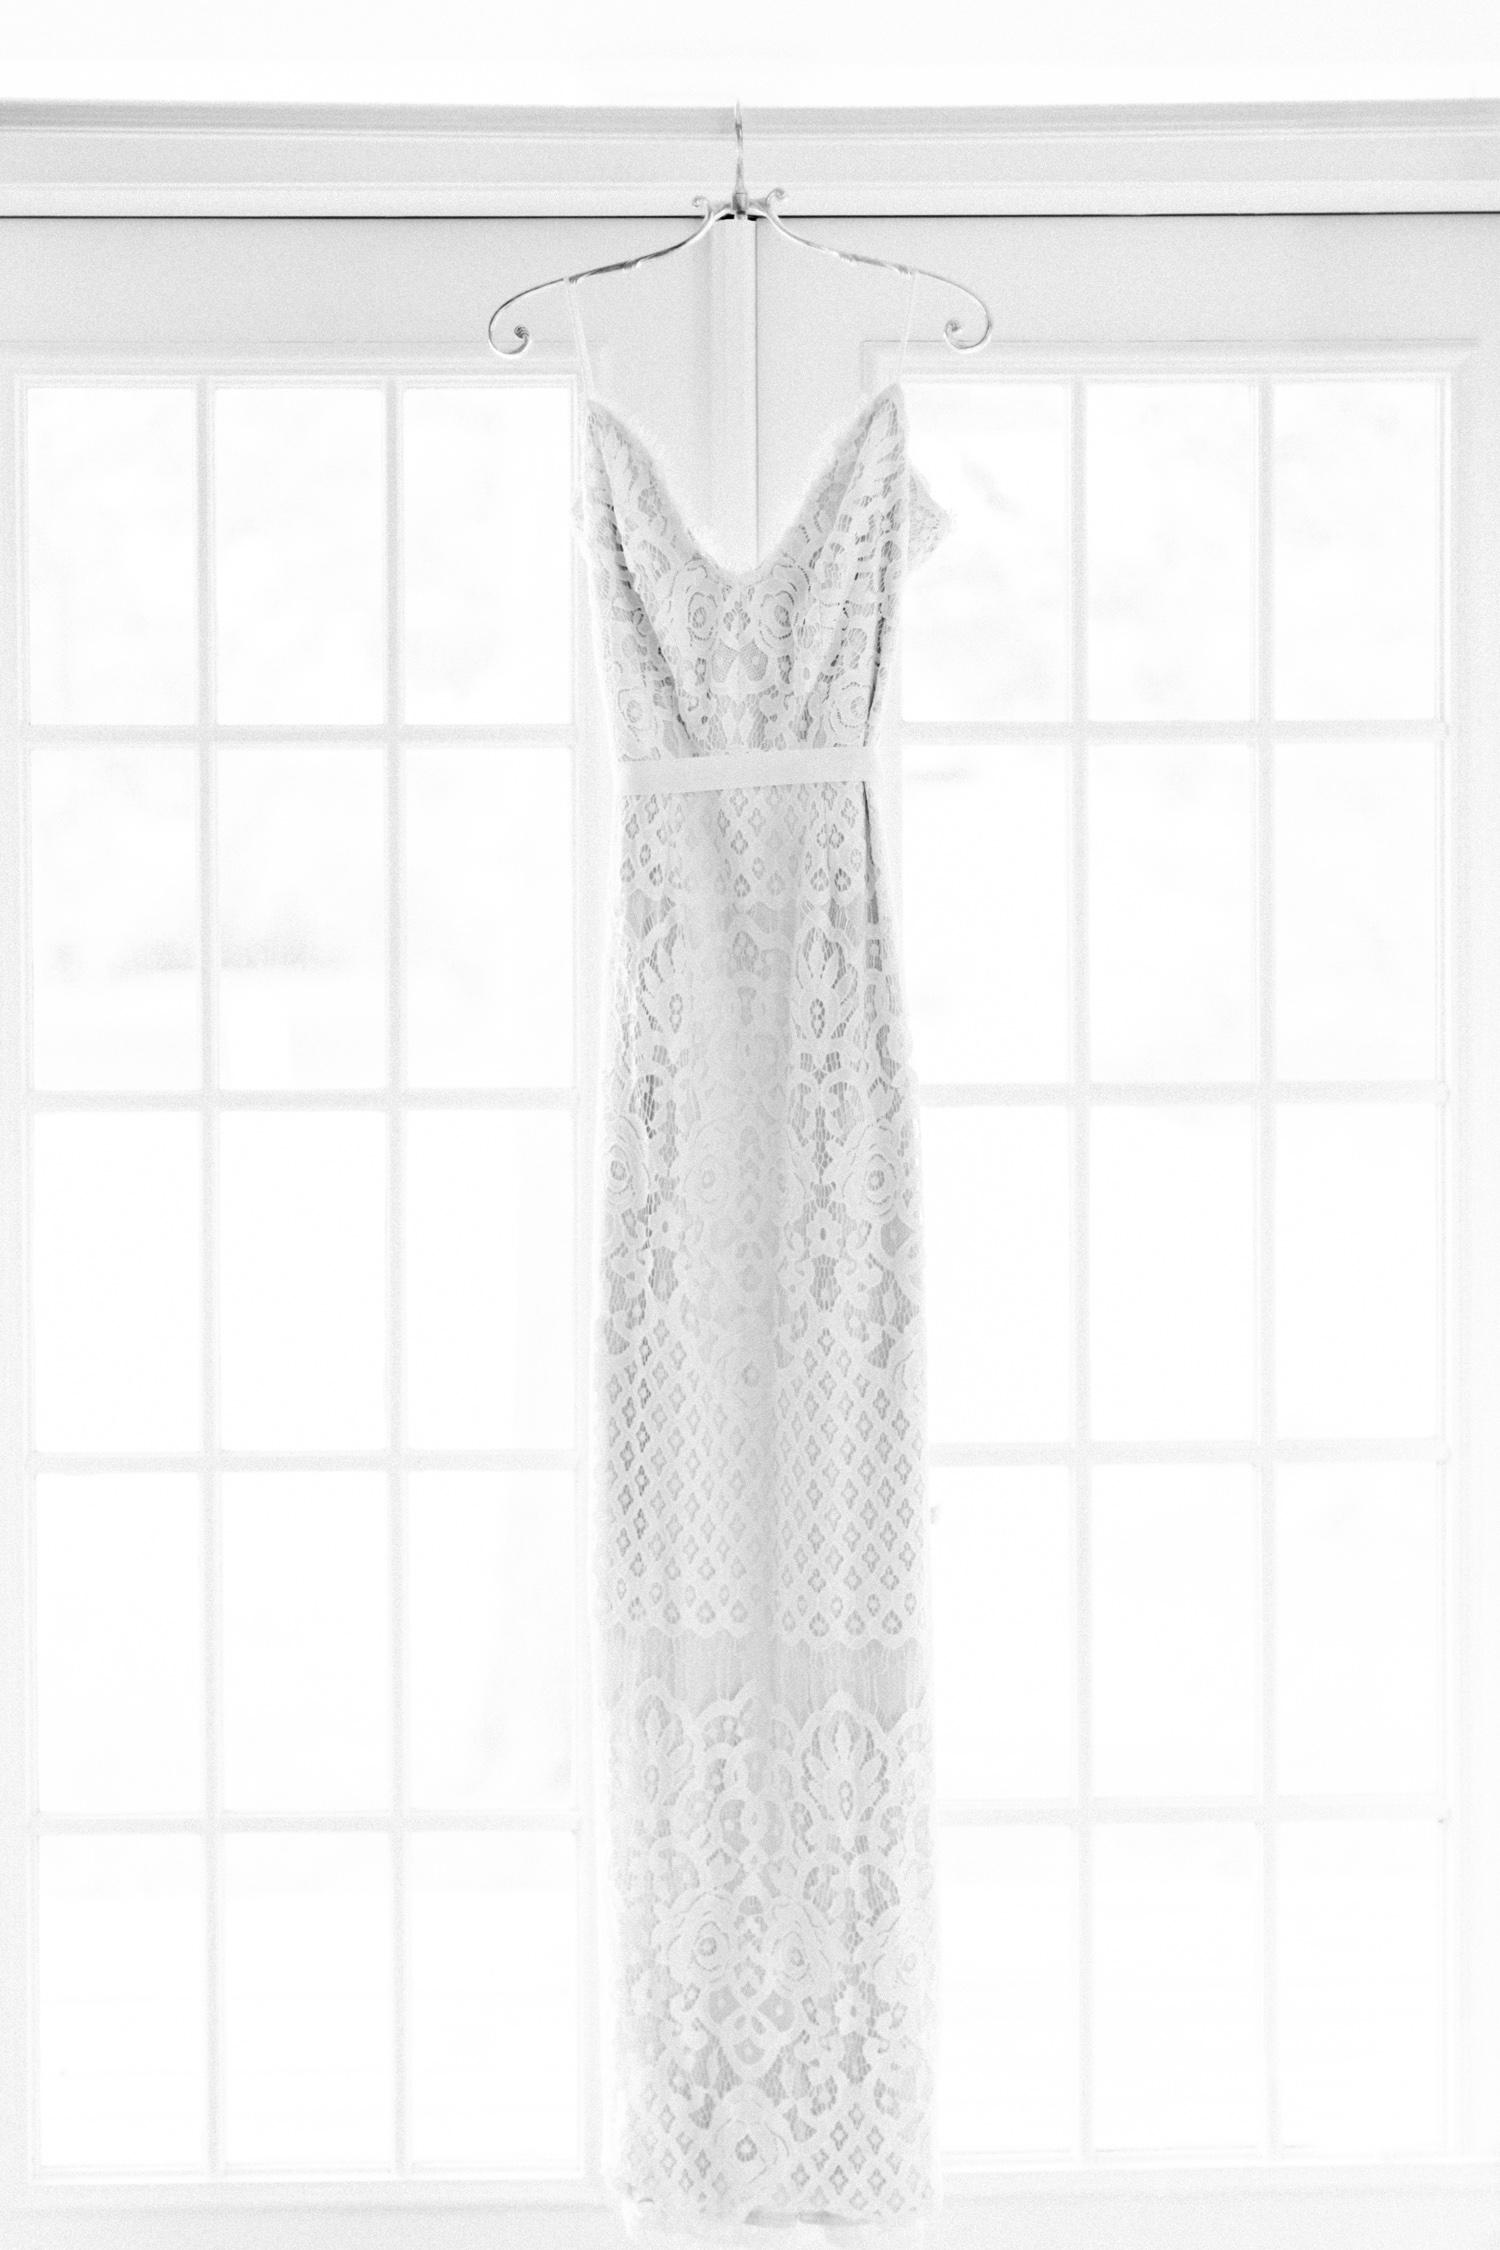 A relaxed BHLDN wedding dress for a Michigan bride's wedding